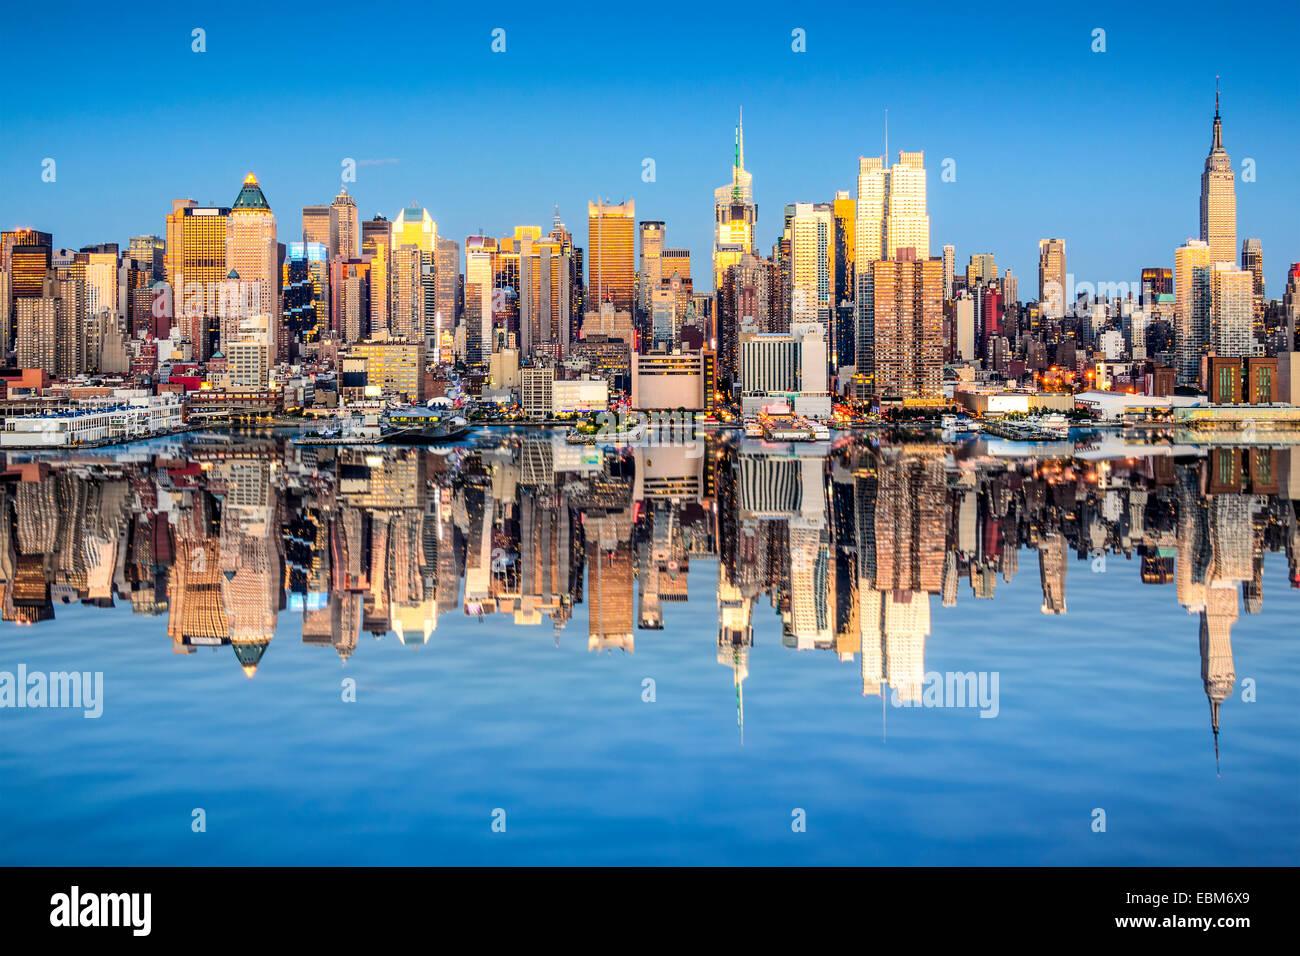 La ville de New York, USA city skyline de Manhattan. Photo Stock